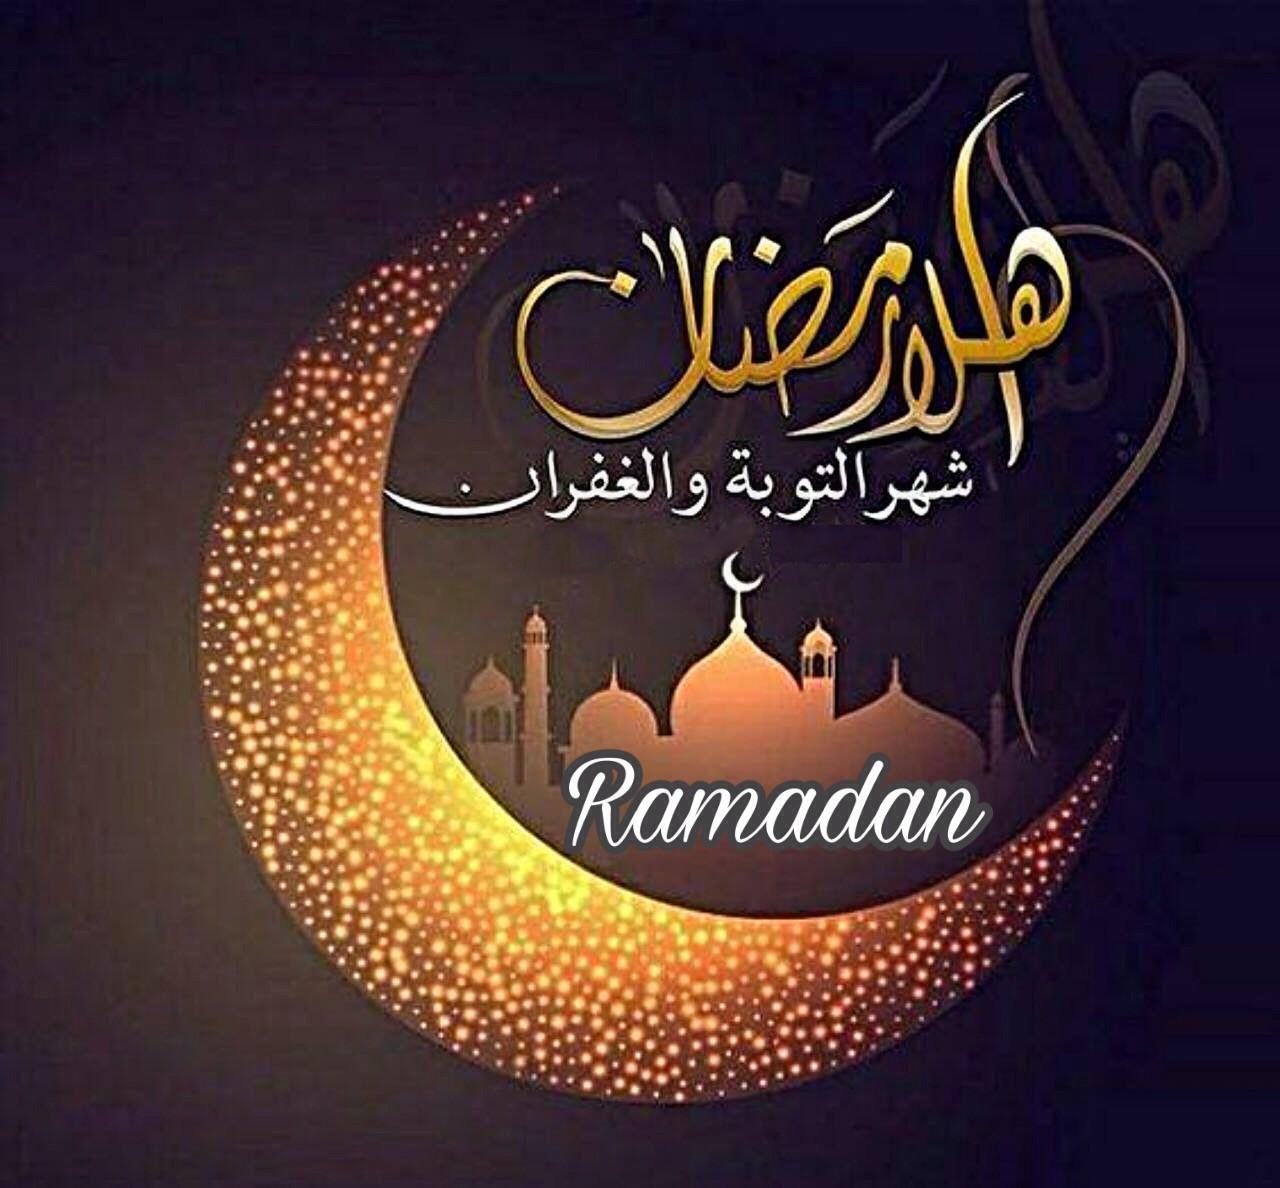 صورة صور رمضان , رمضان شهر الخير و البركه بالصور